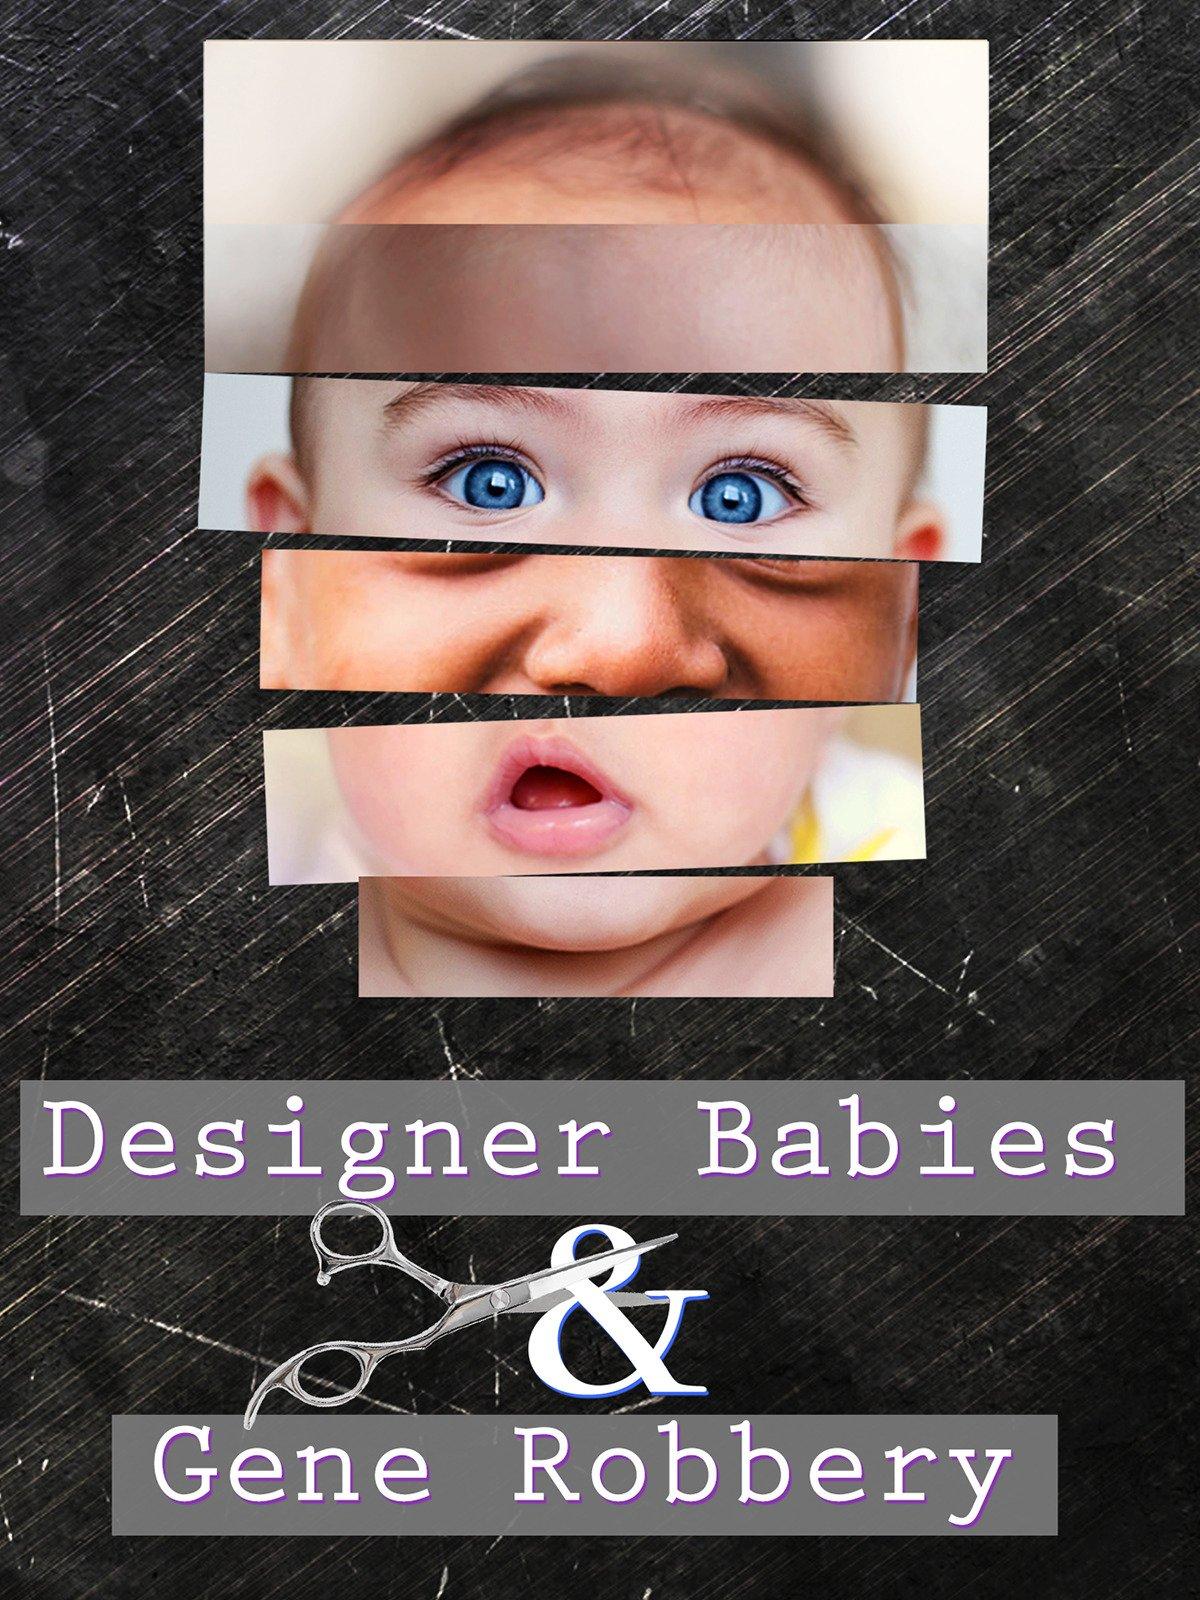 Designer Babies and Gene Robbery